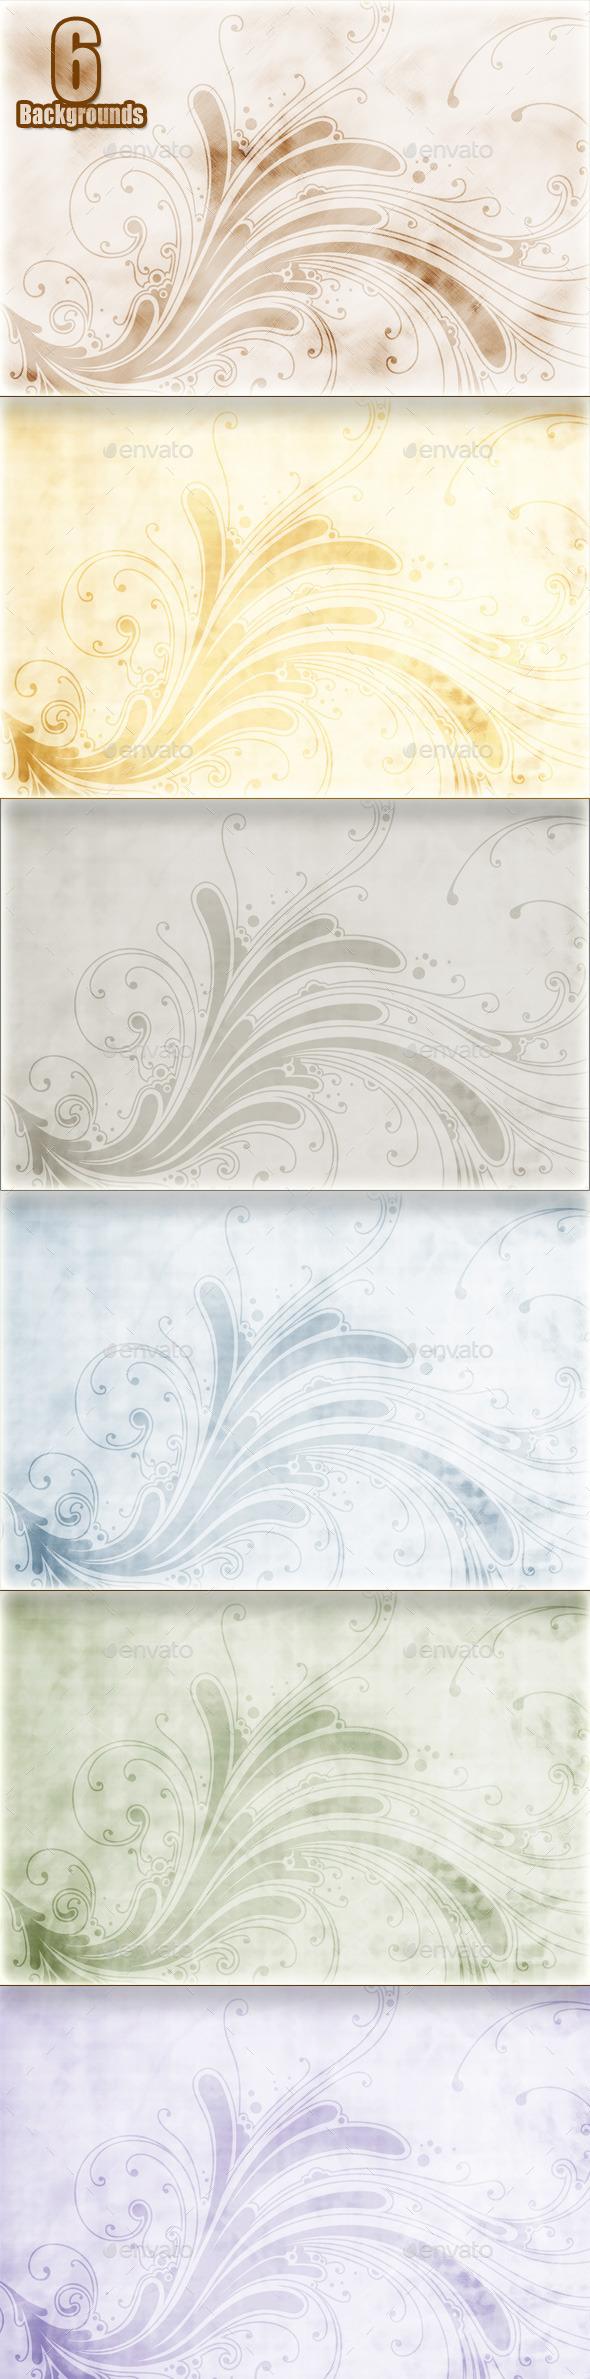 Vintage Flowers Backgrounds - Backgrounds Graphics